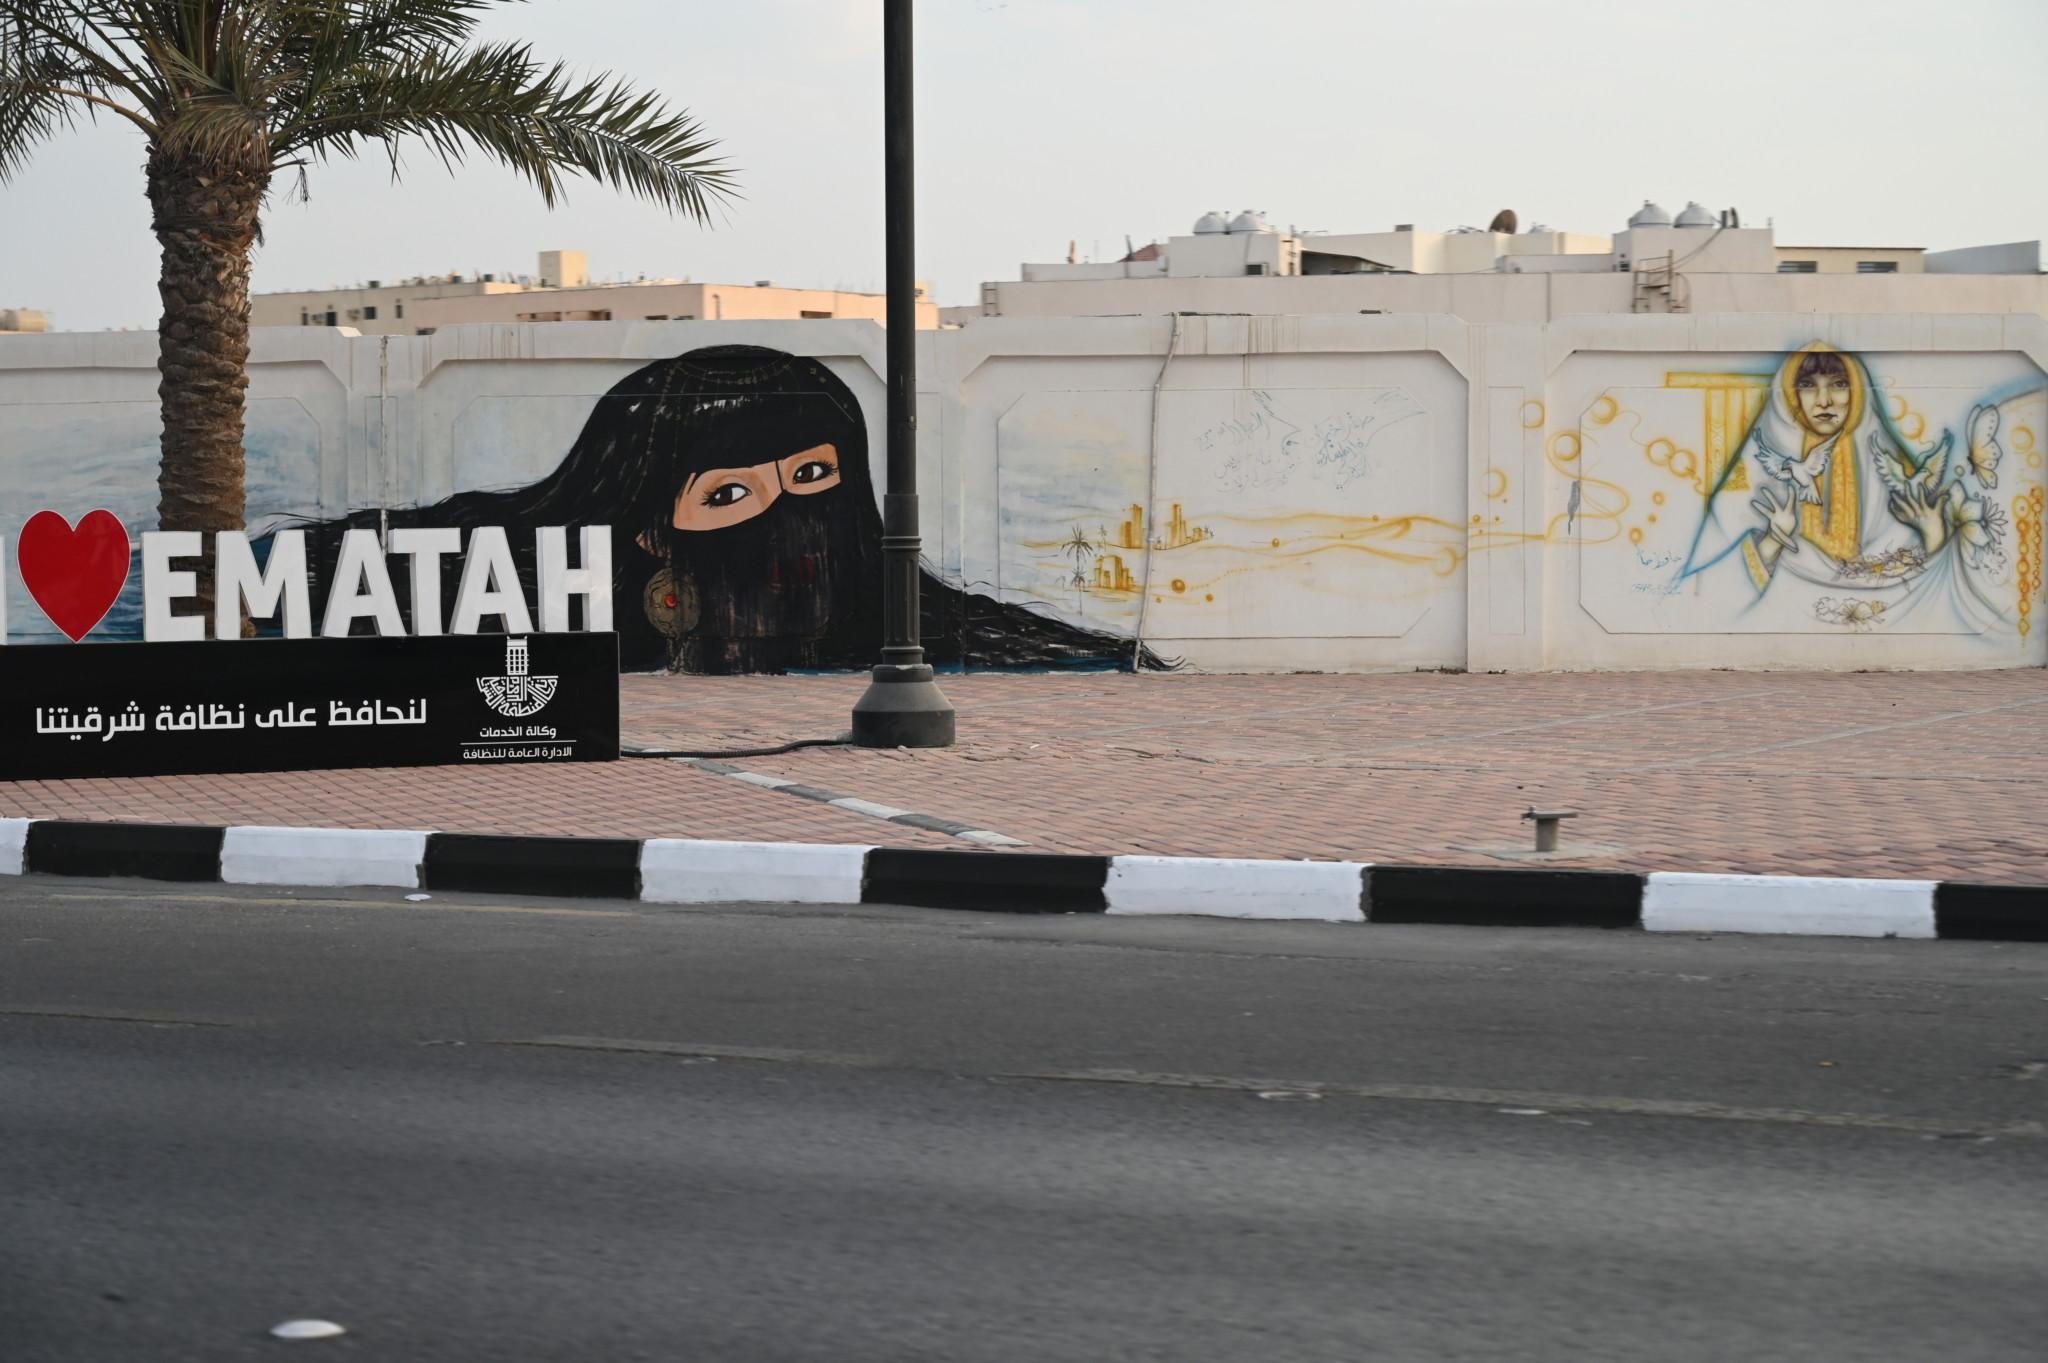 Als Frau durch Saudi-Arabien reisen